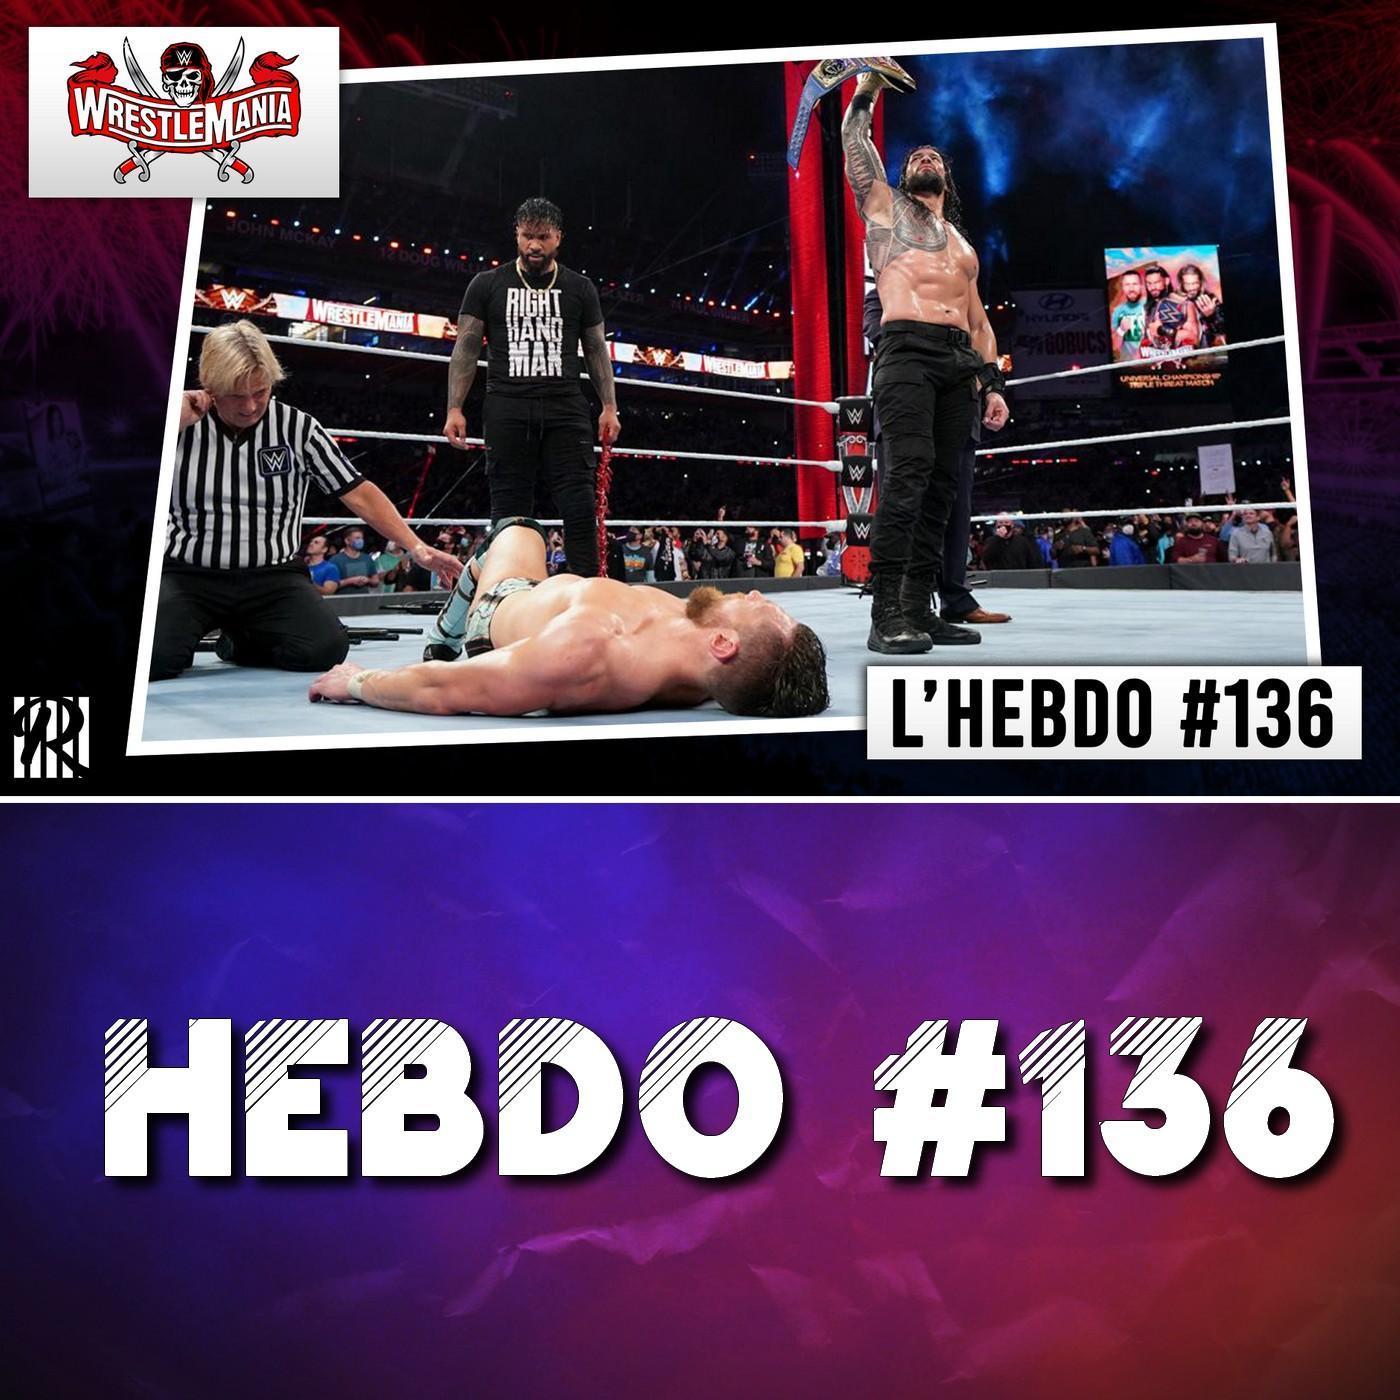 L'Hebdo 136 : Review : Wrestlemania 37 + Raw et NXT + AEW DYNAMITE